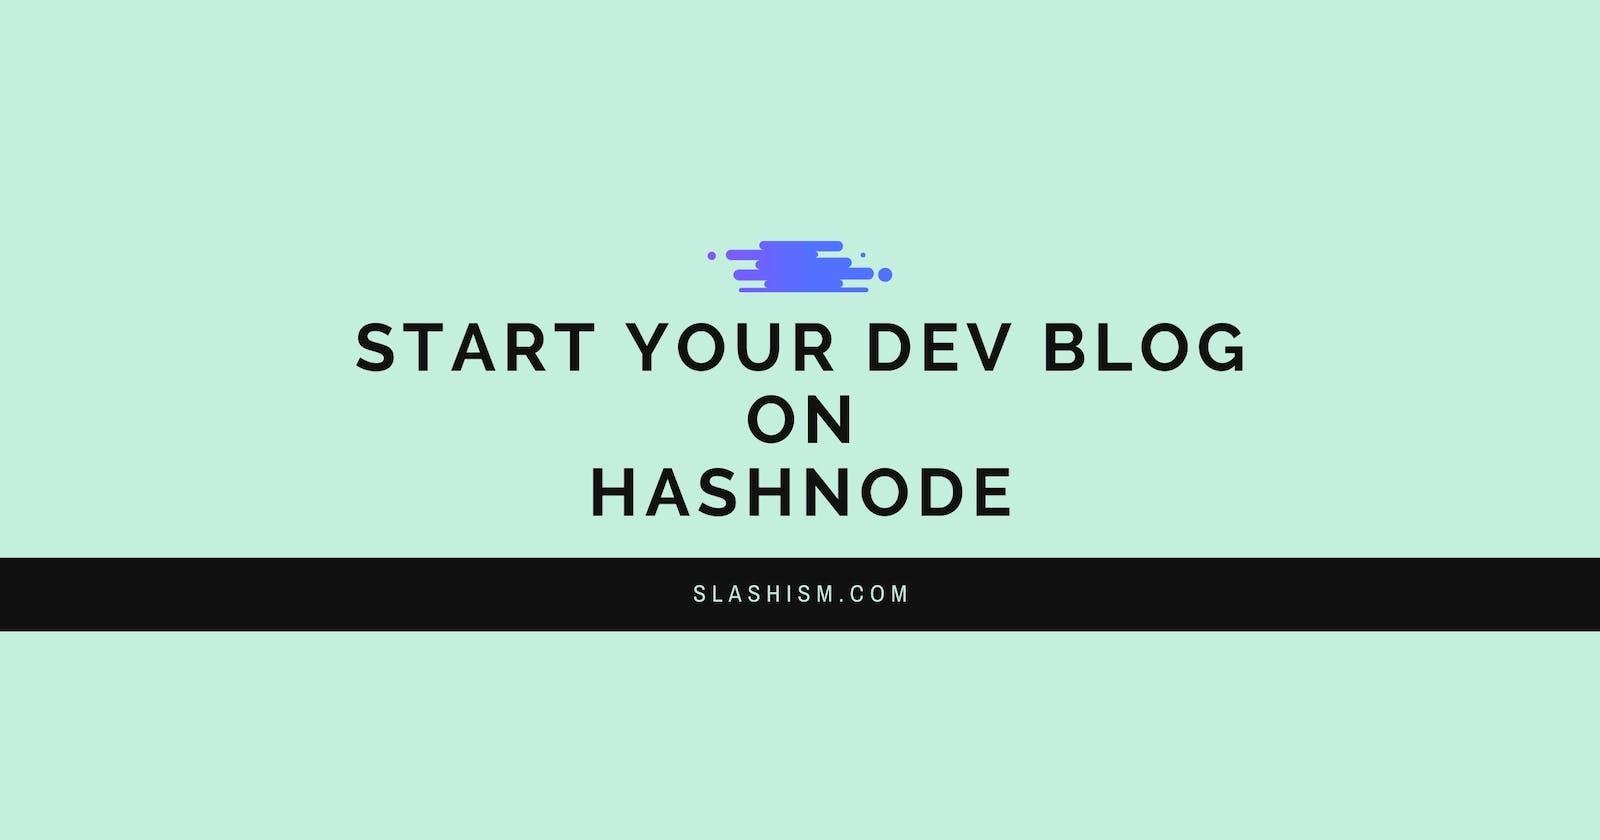 Why Should You Start Your Dev Blog On Hashnode